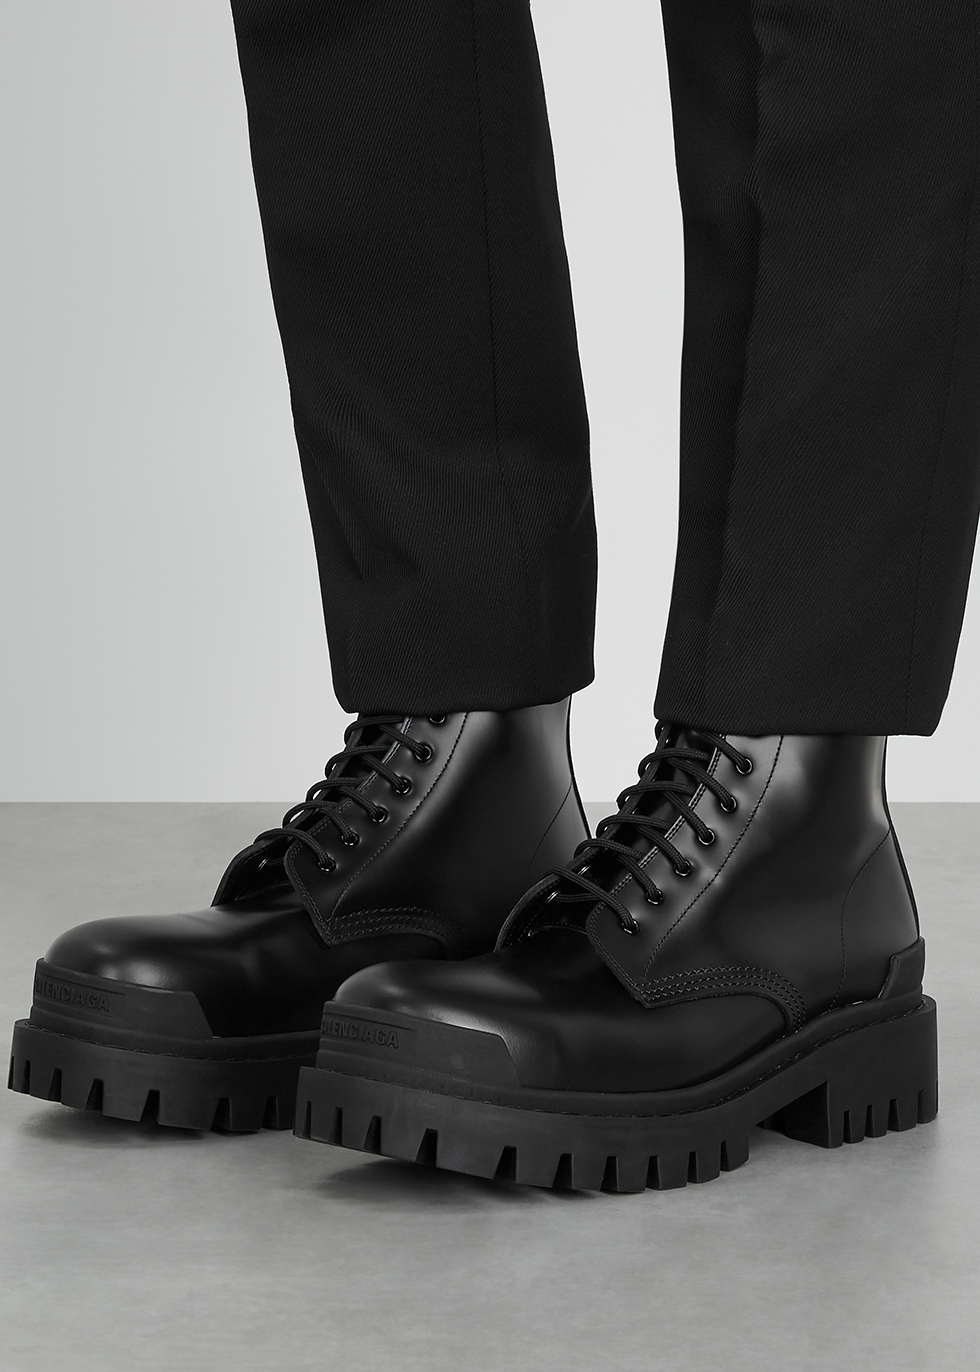 Balenciaga Strike black leather ankle